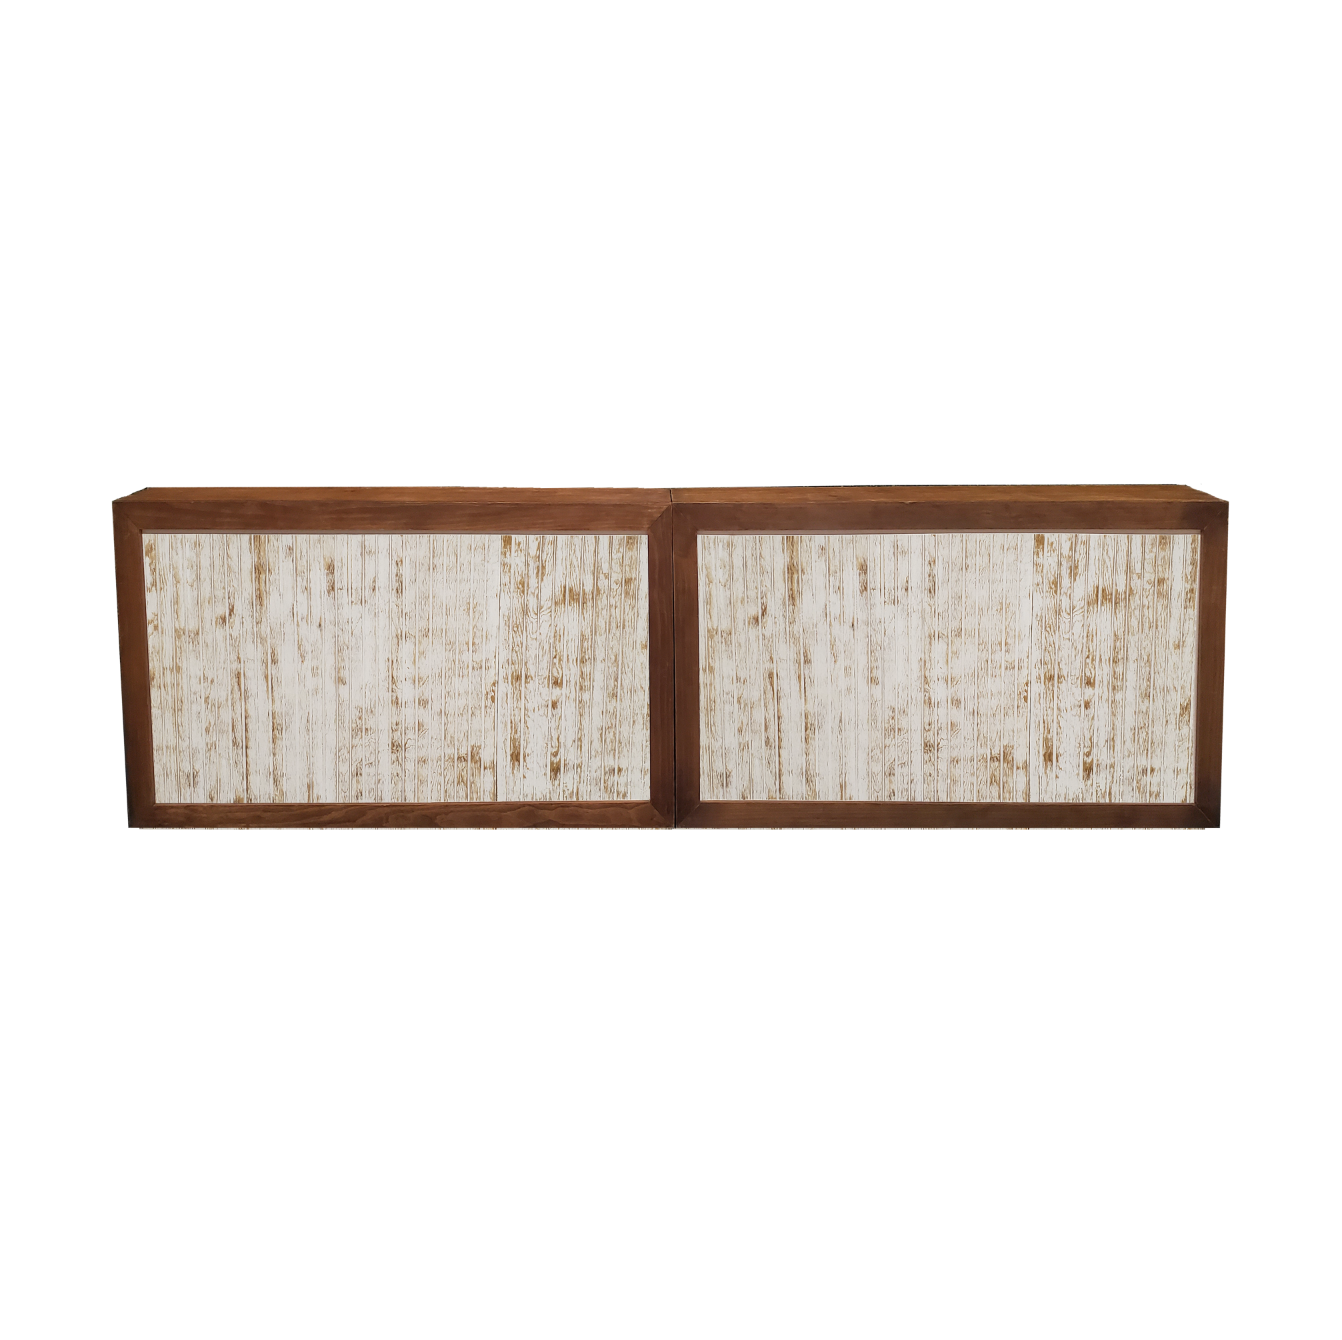 Double Wood Frame Bar/White Wash Insert  $400